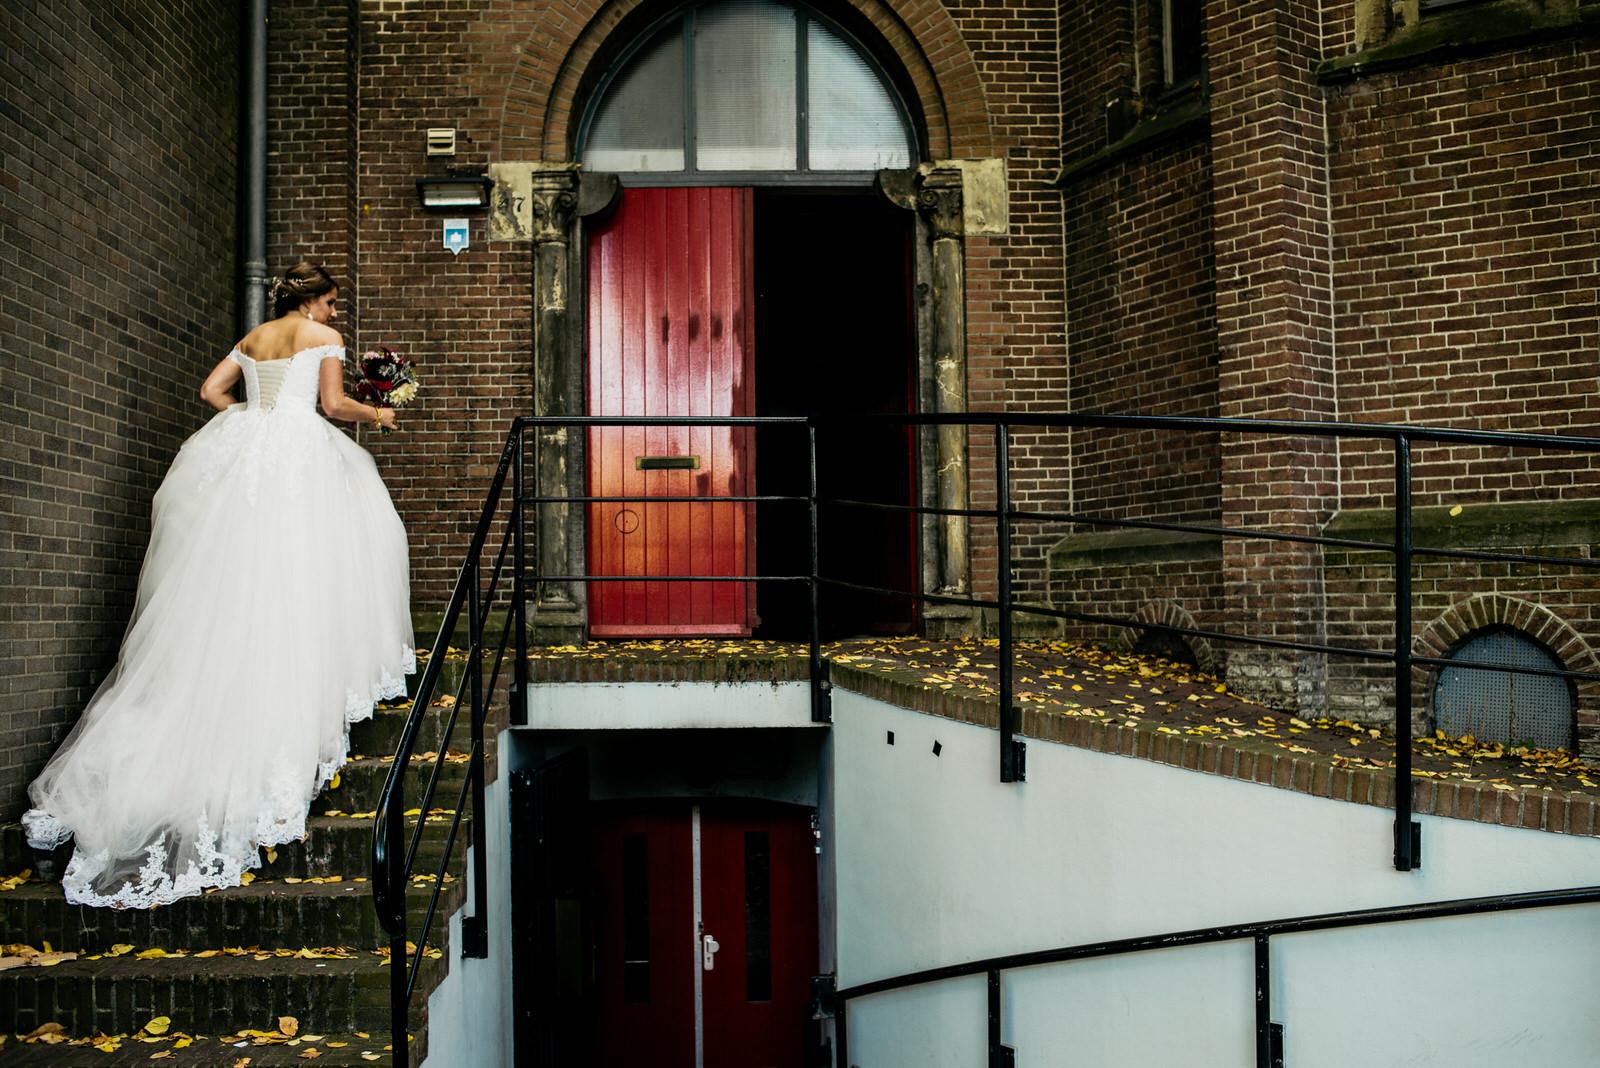 Suus and Jelger's Amsterdam Wedding